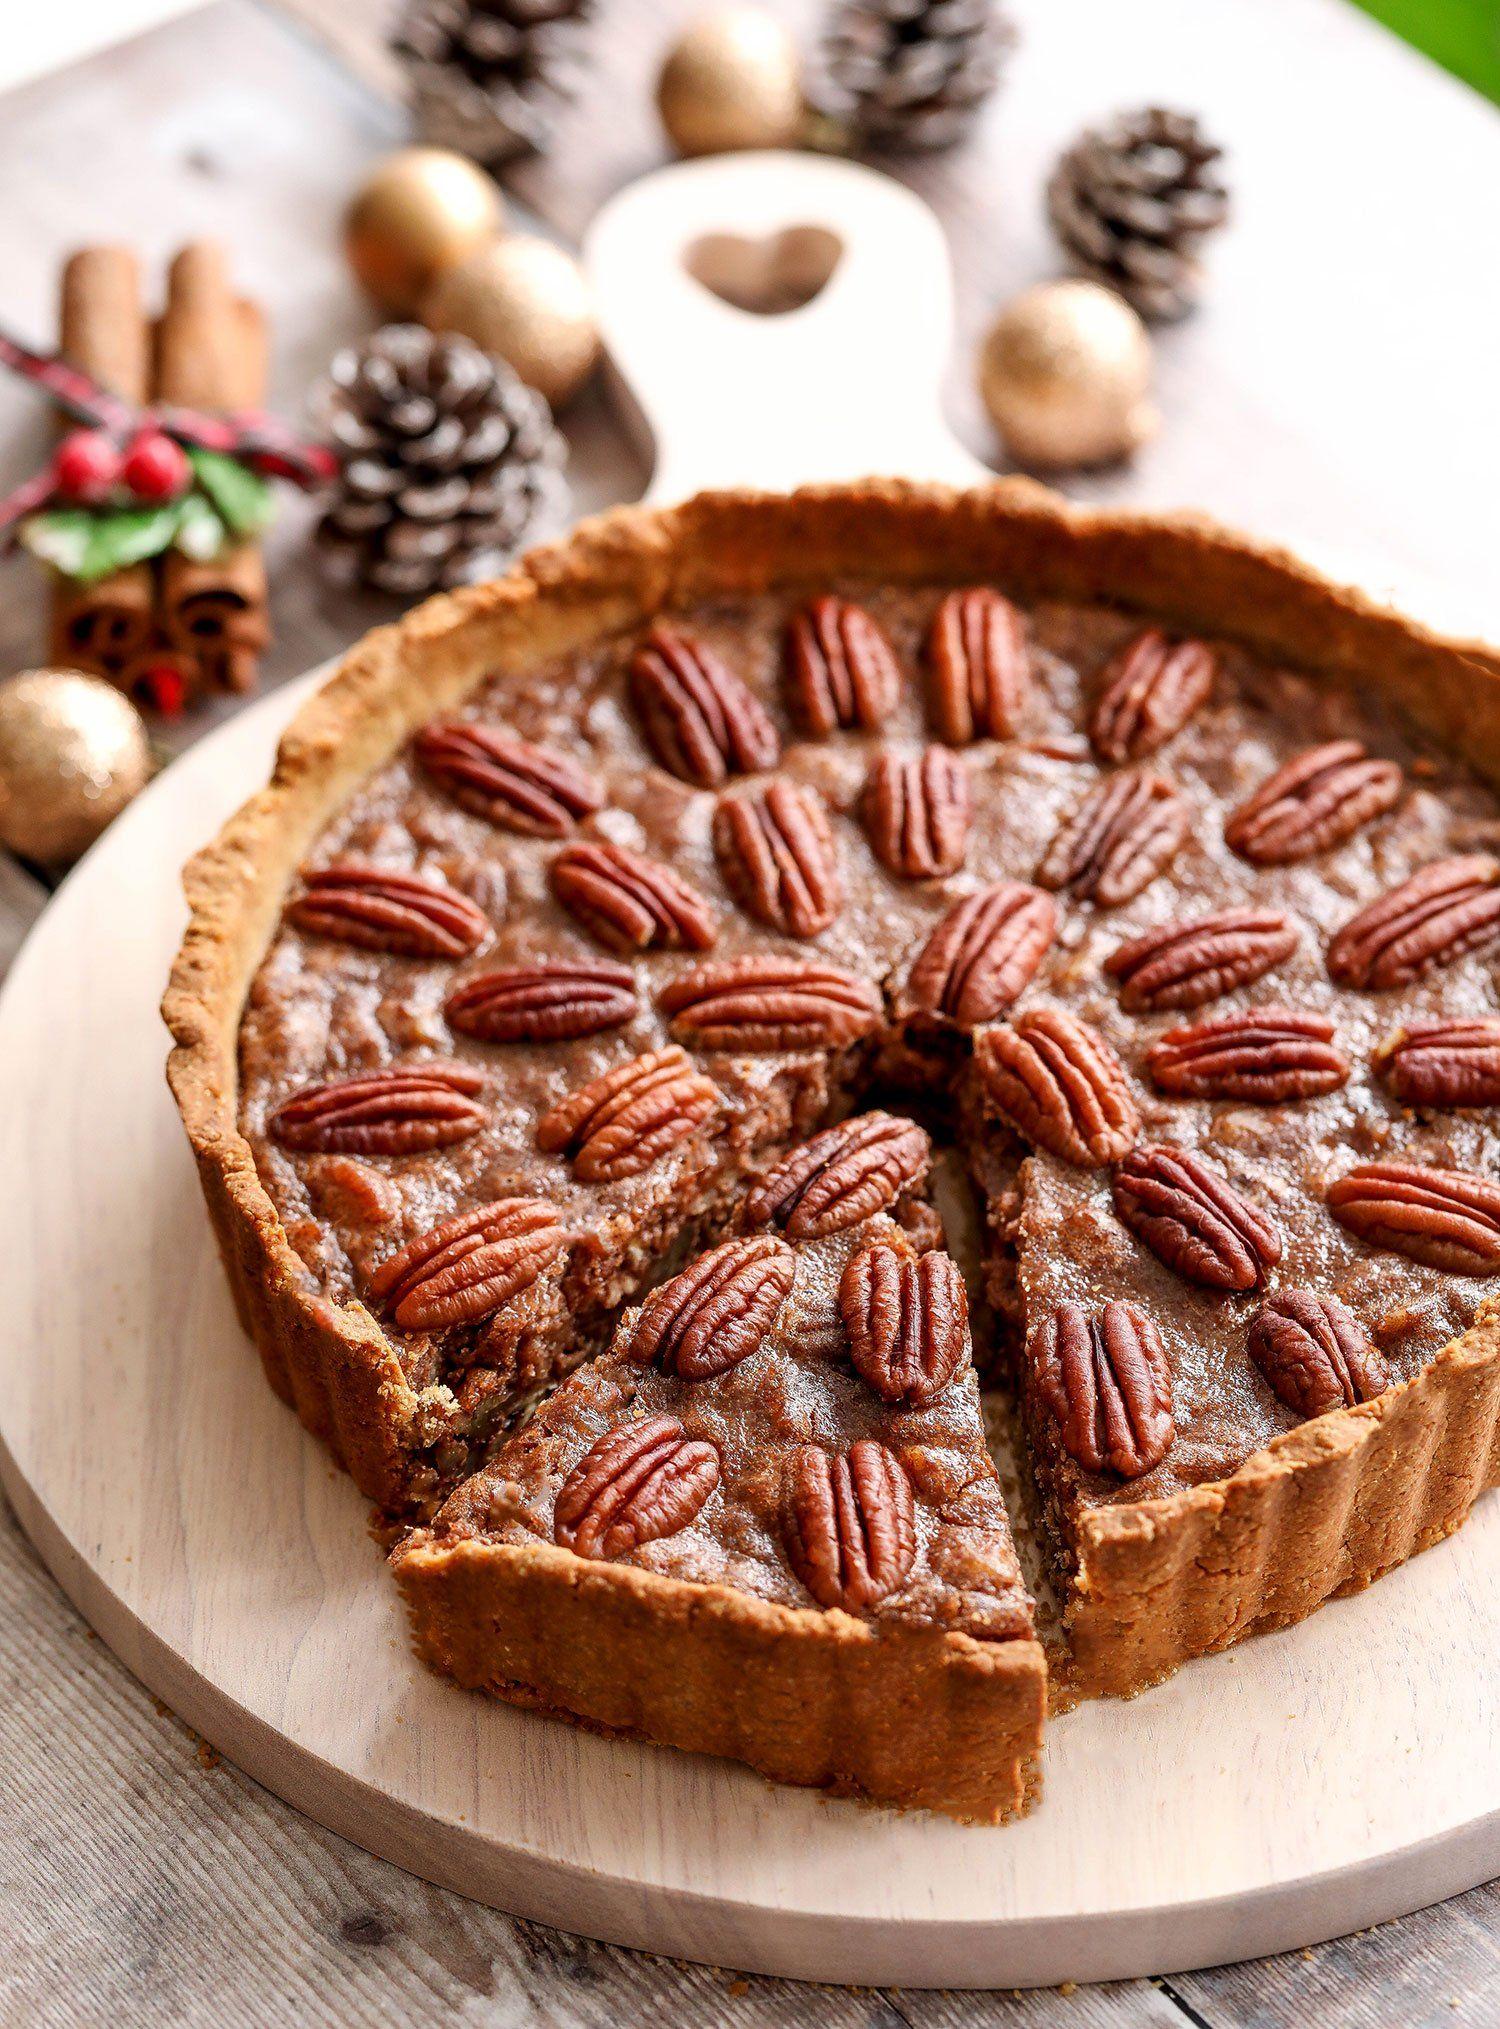 Vegan Glutenfree Spiced Pecan Pie (With images) Vegan